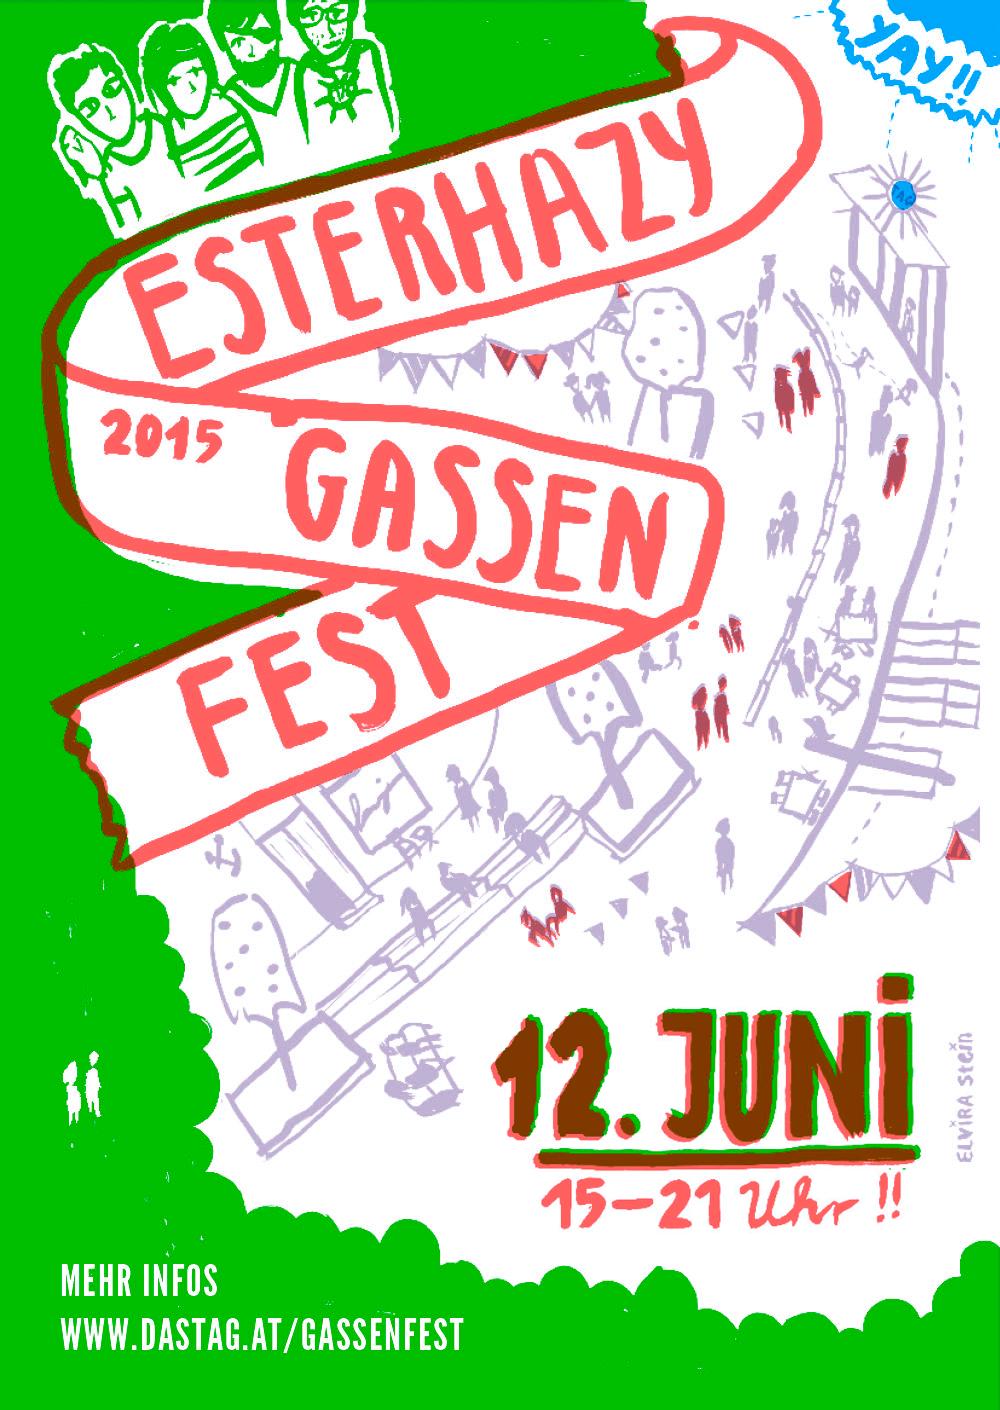 esterhazygassenfest-2015